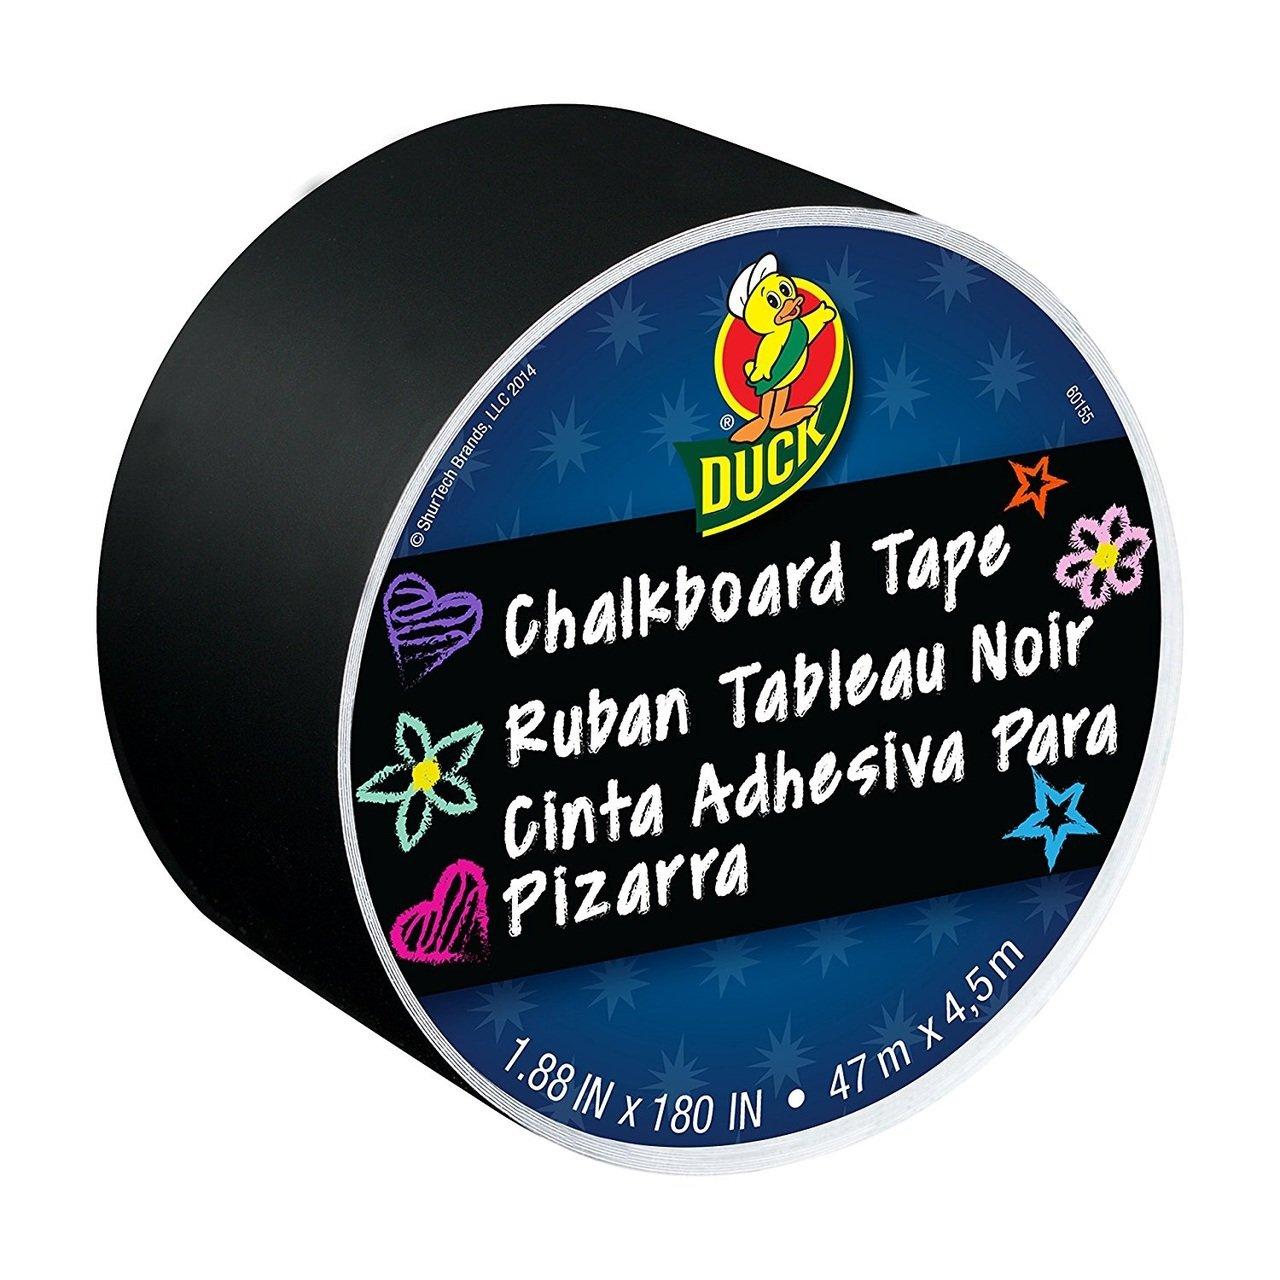 Bulk Chalkboard Tape Black, 1.88